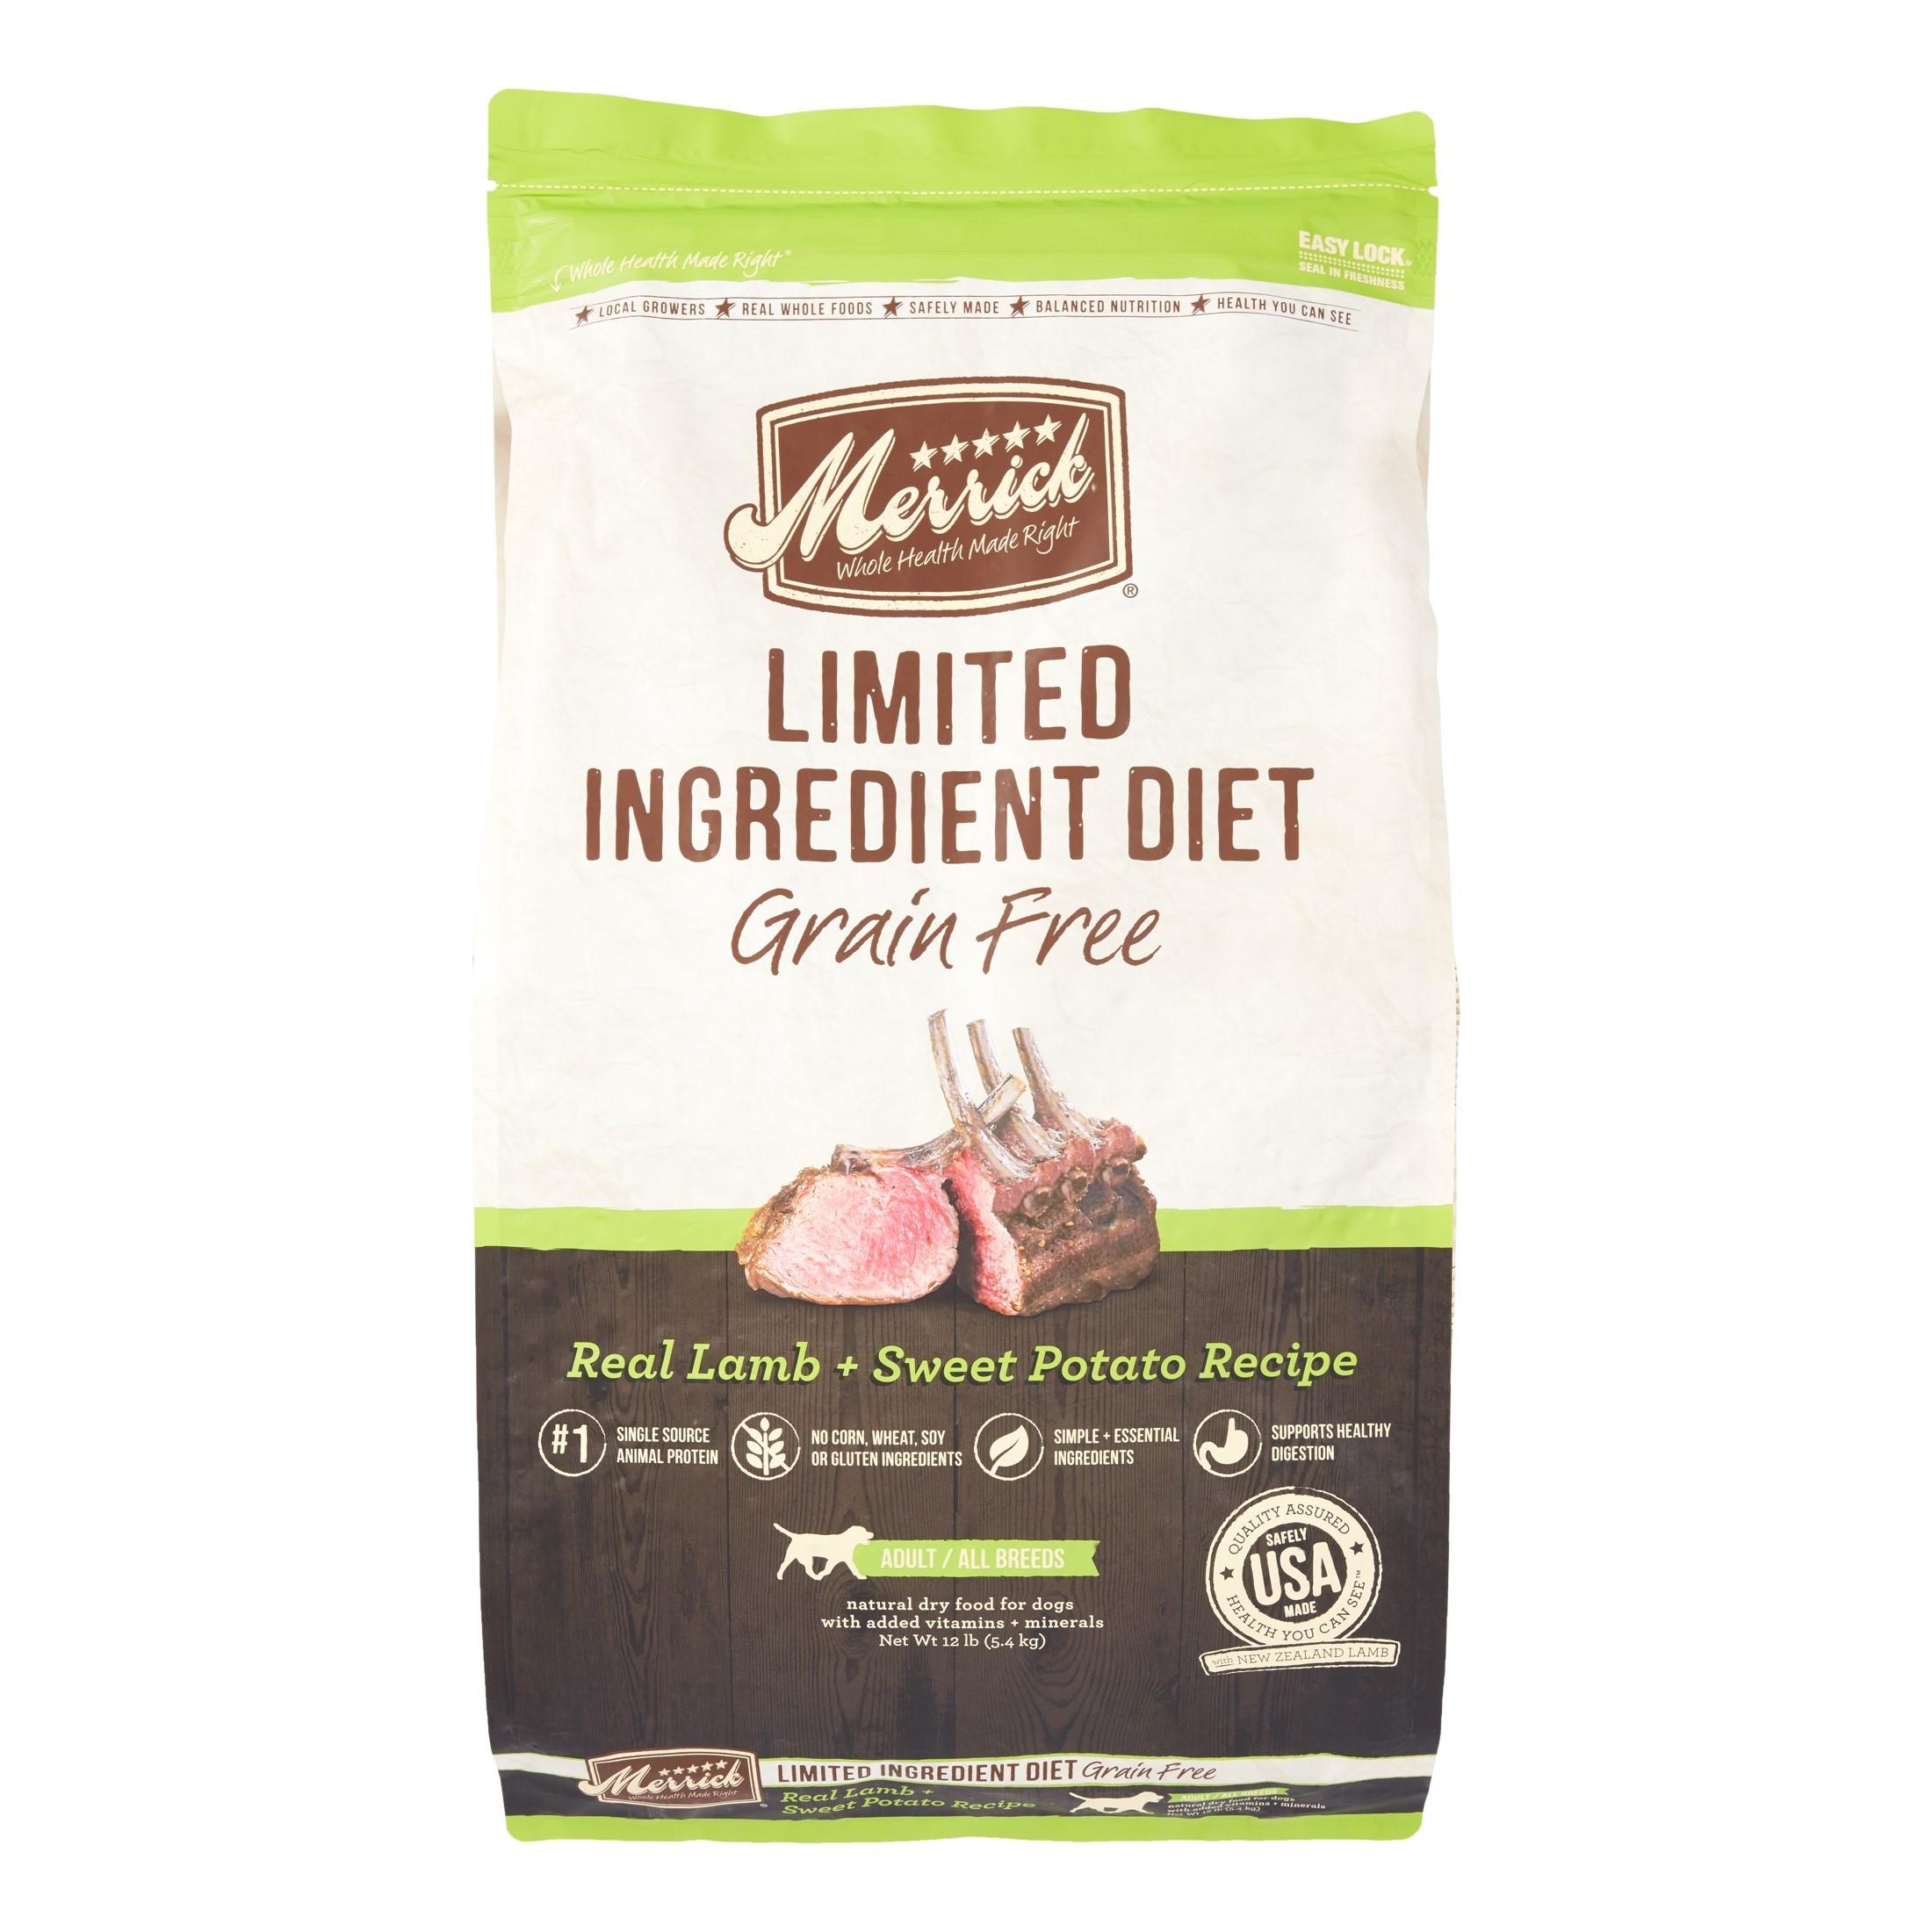 Merrick Limited Ingredient Diet Grain-Free Real Lamb & Sweet Potato Recipe Dog Food, 12 Lb